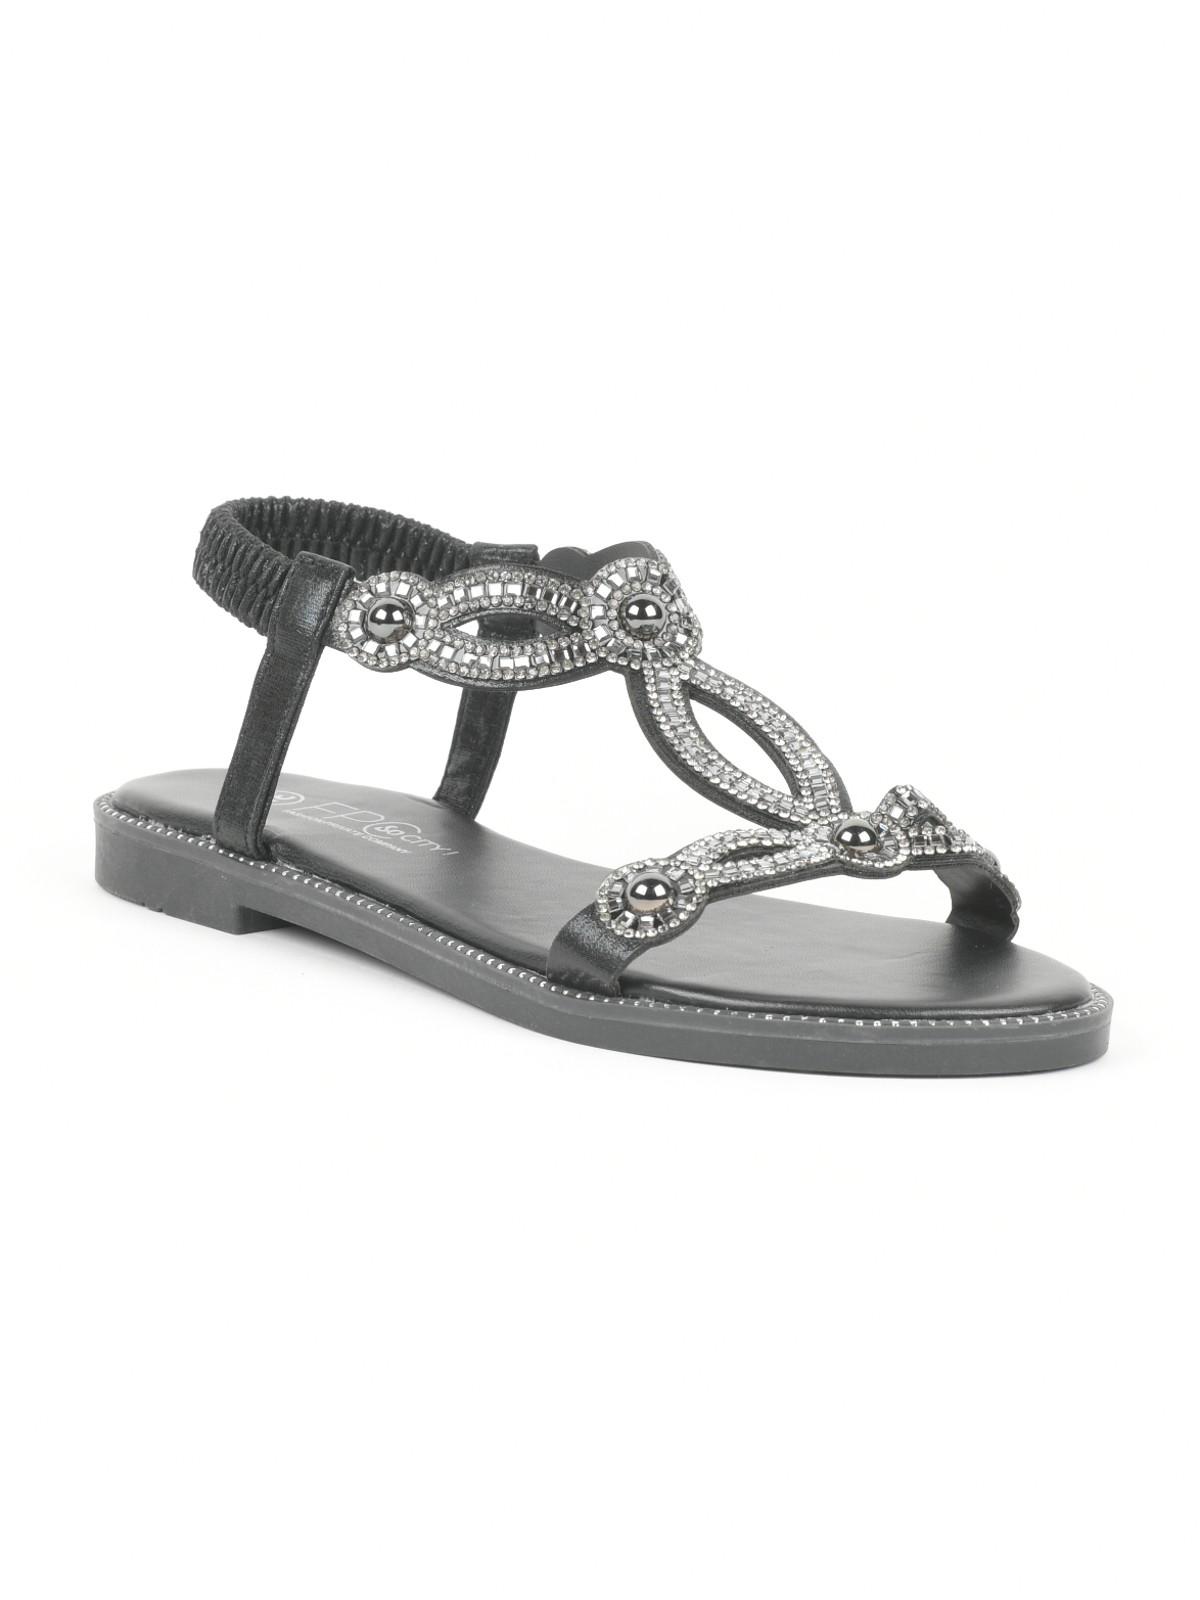 fbfe6896e Nu pieds - Sandales Femme - DistriCenter